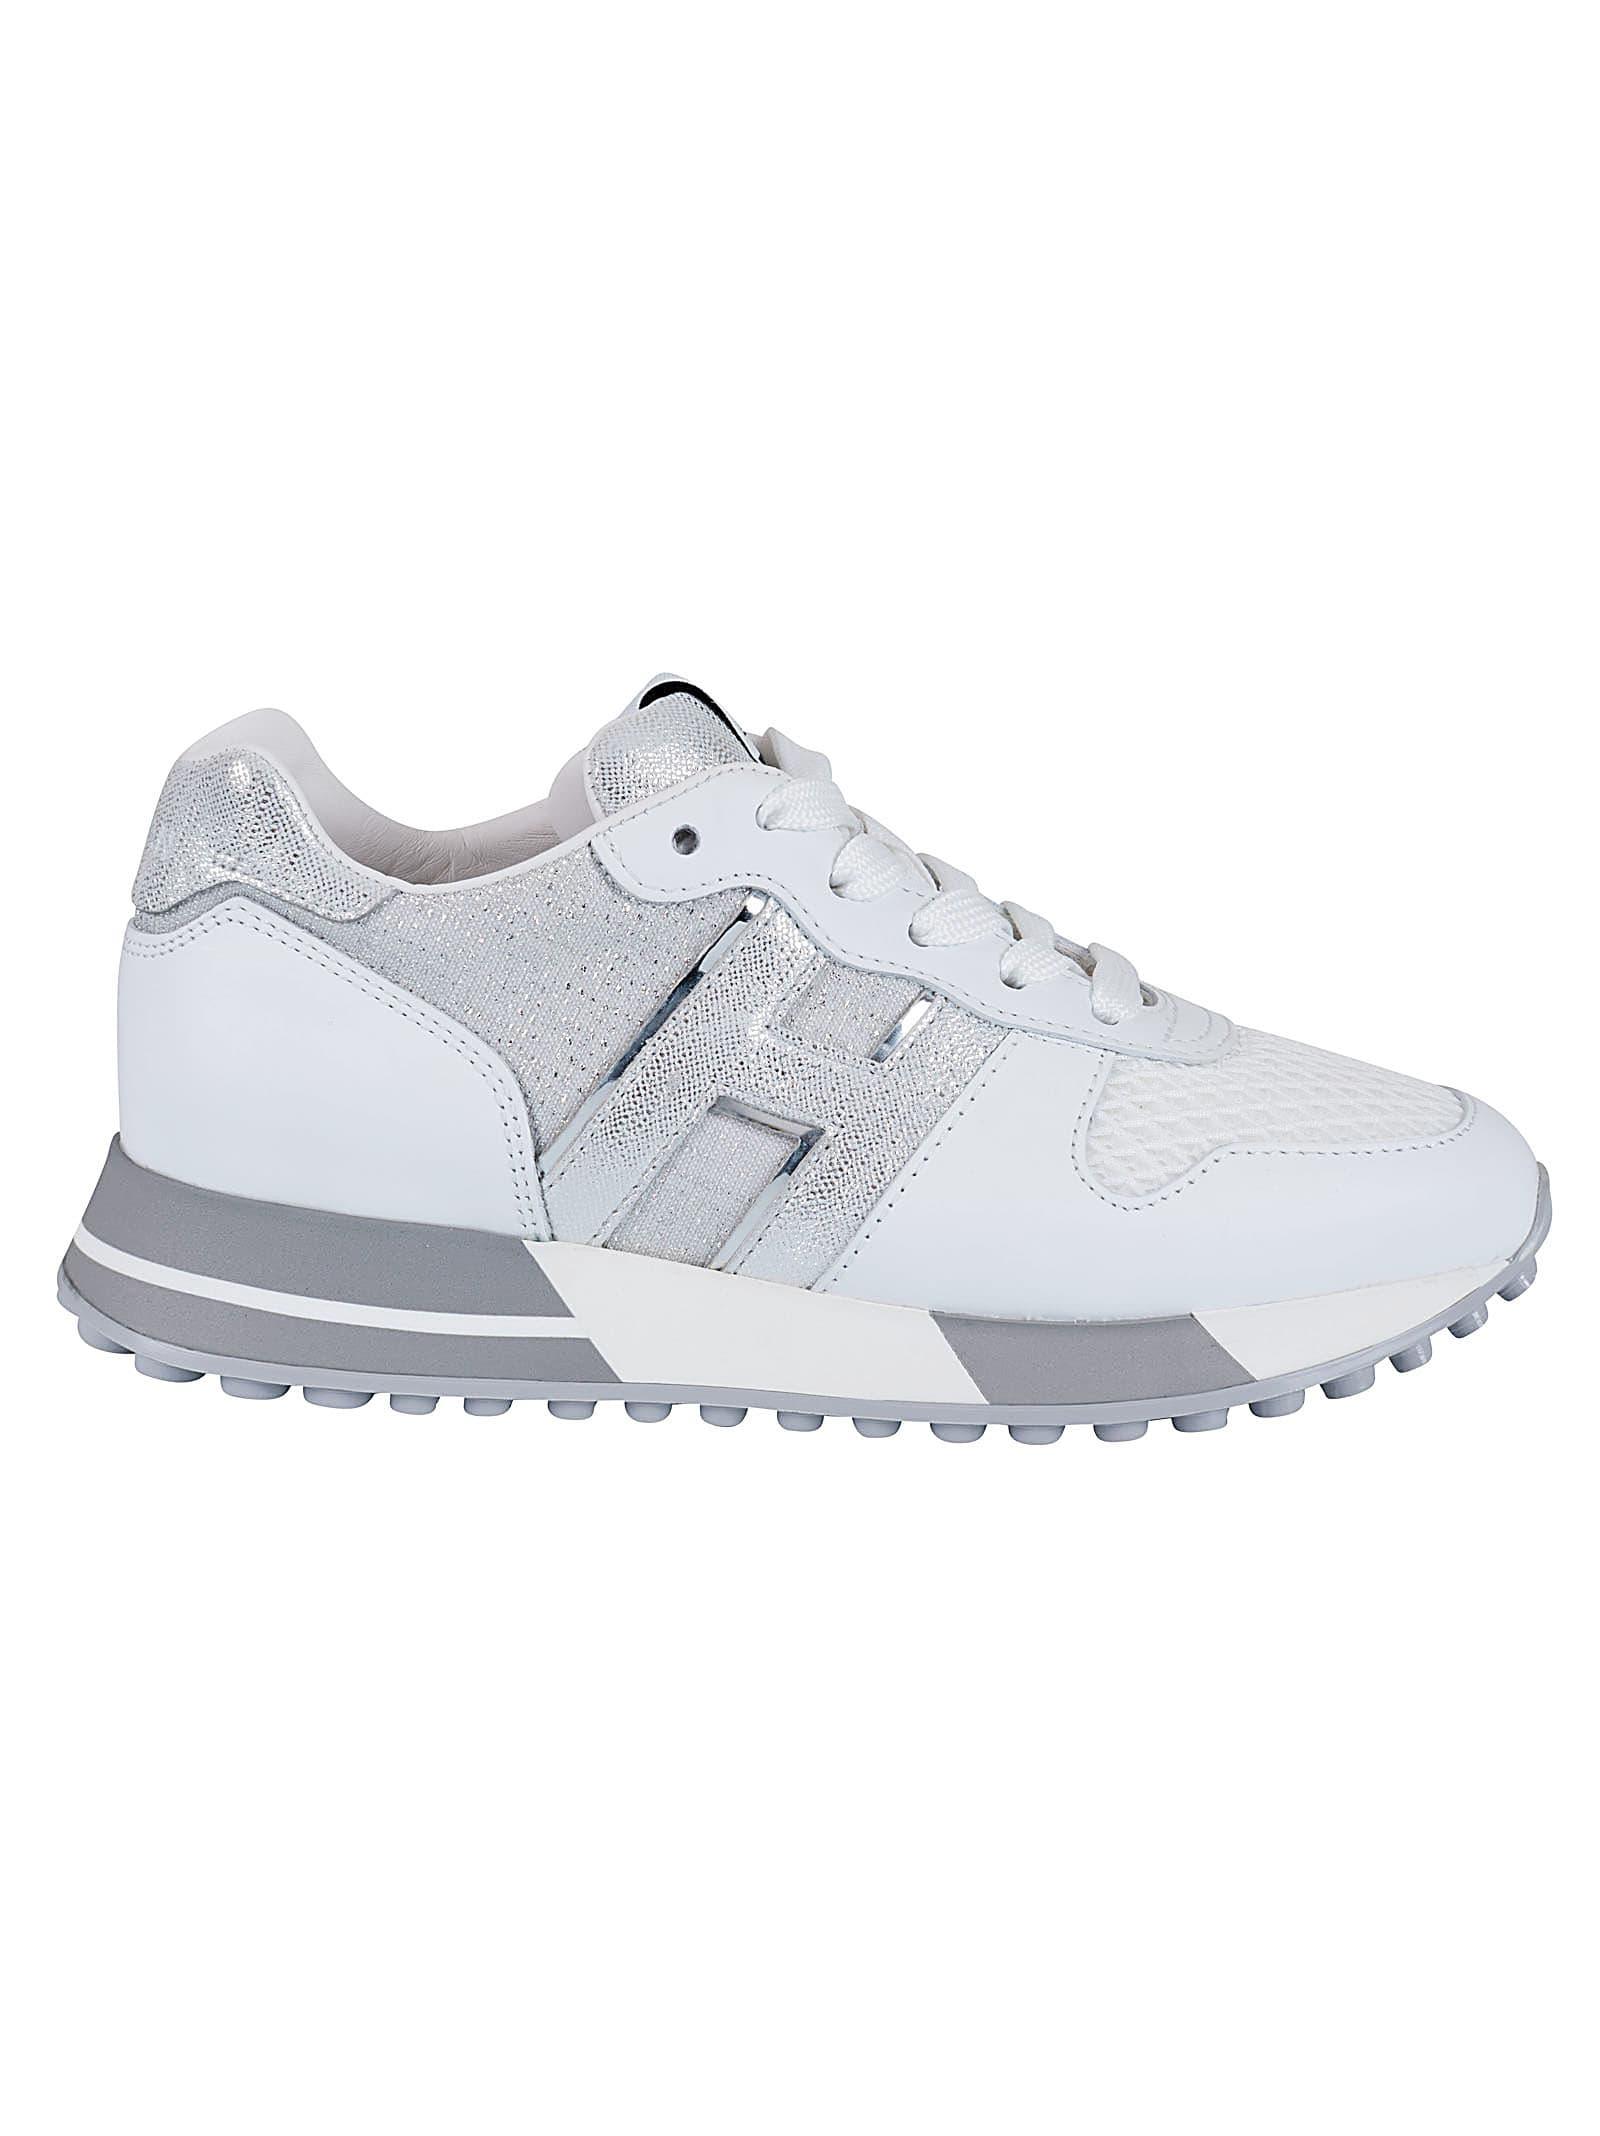 Hogan Sneakers | italist, ALWAYS LIKE A